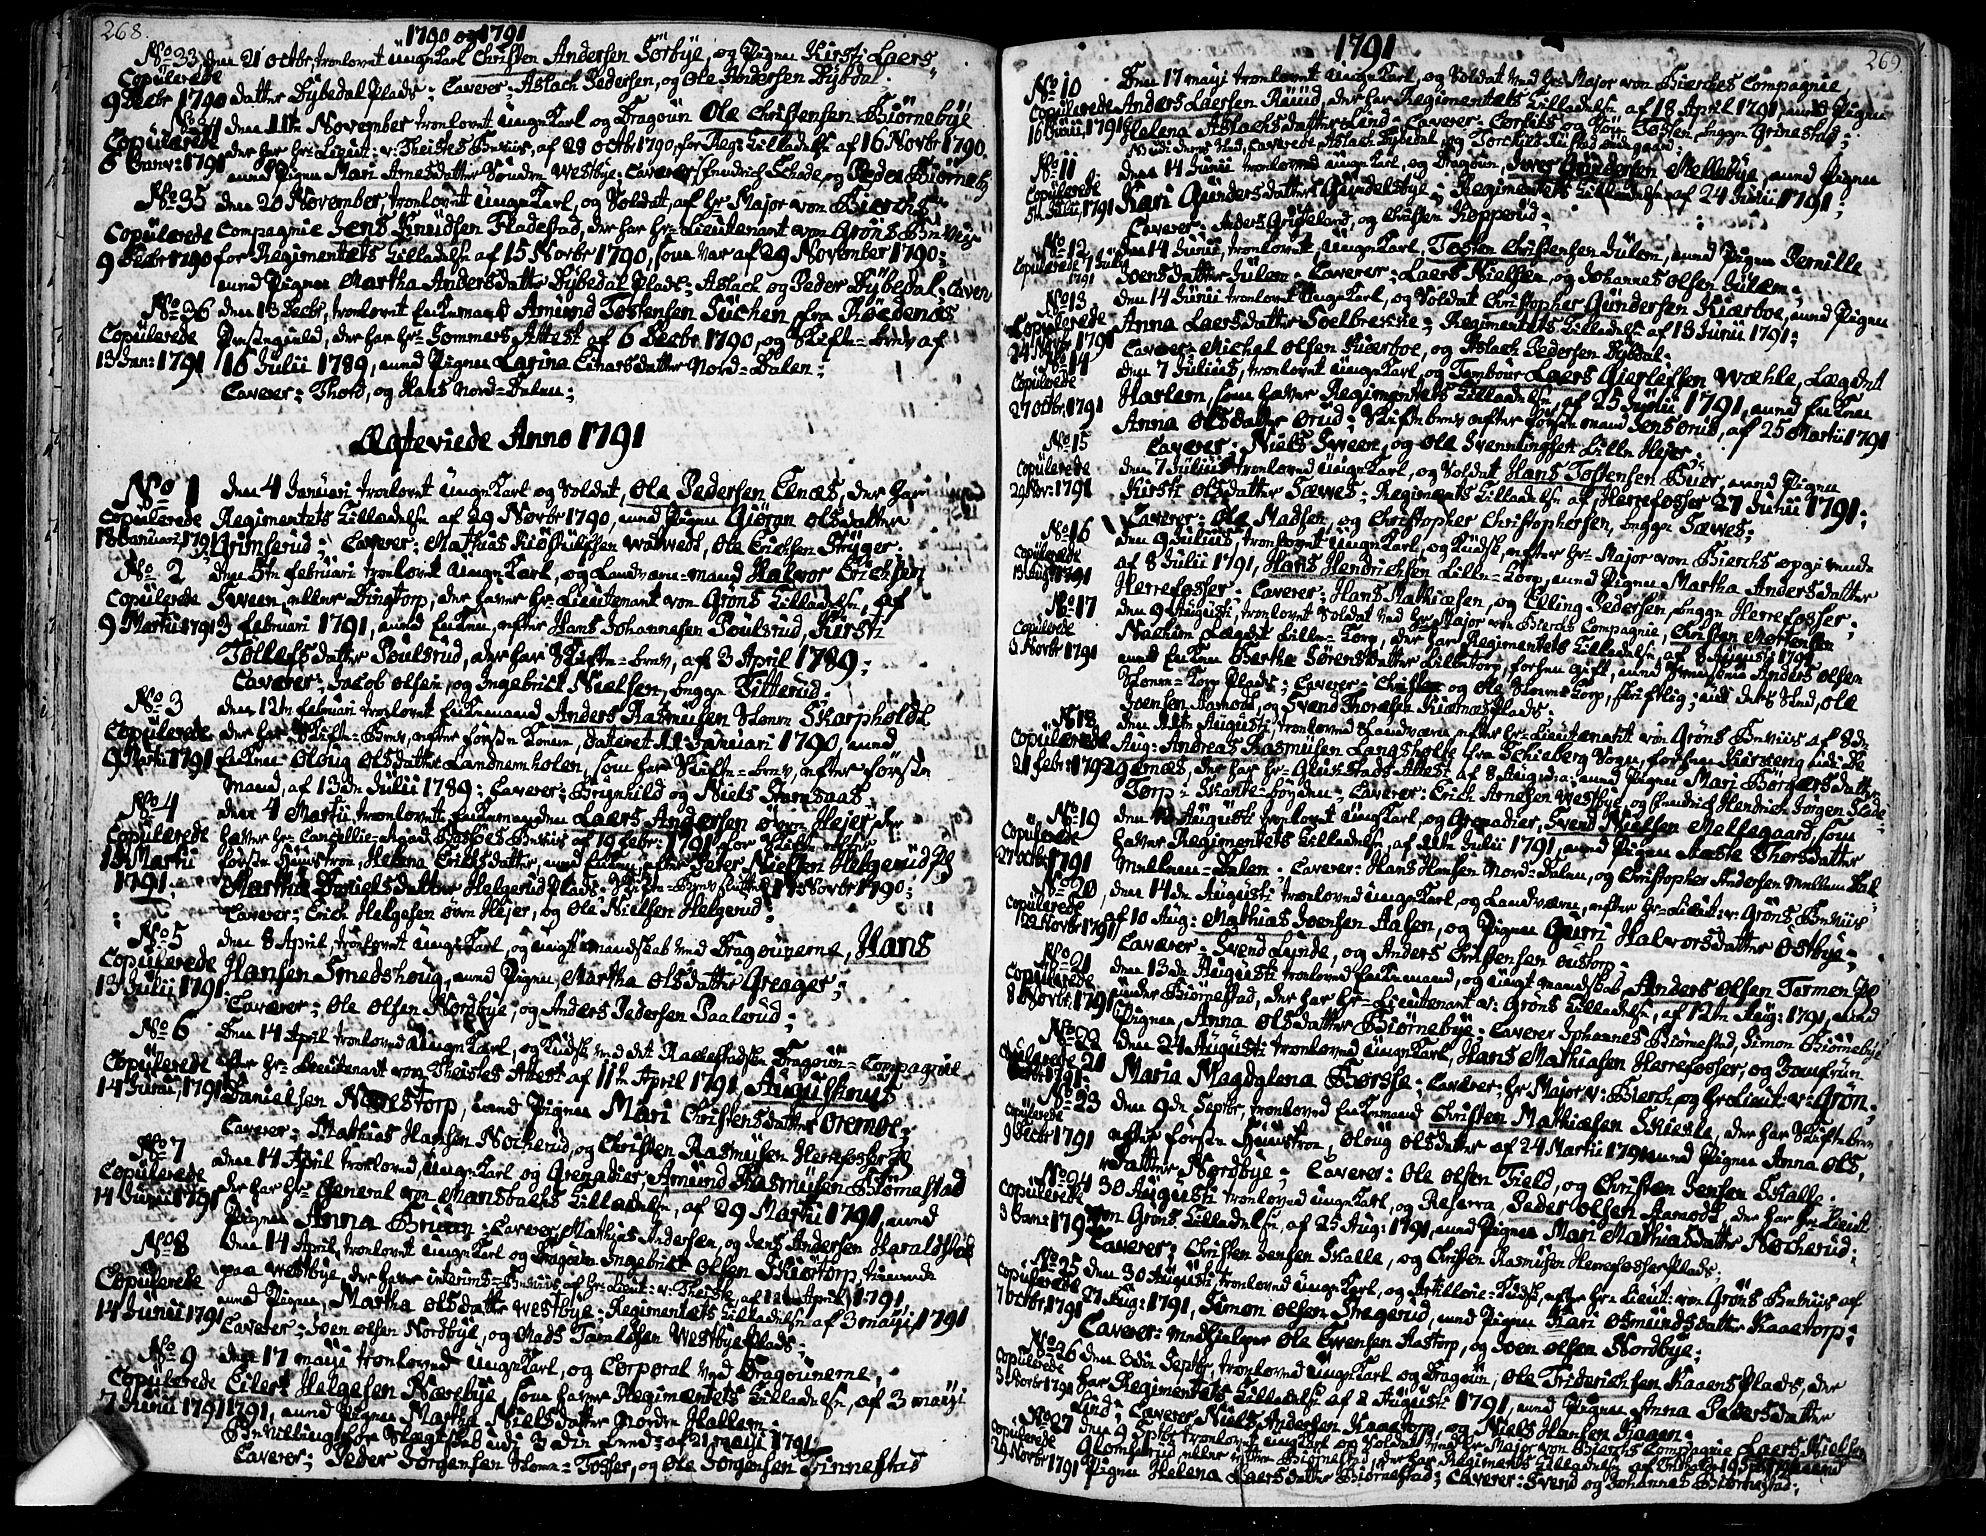 SAO, Rakkestad prestekontor Kirkebøker, F/Fa/L0005: Ministerialbok nr. I 5, 1784-1814, s. 268-269